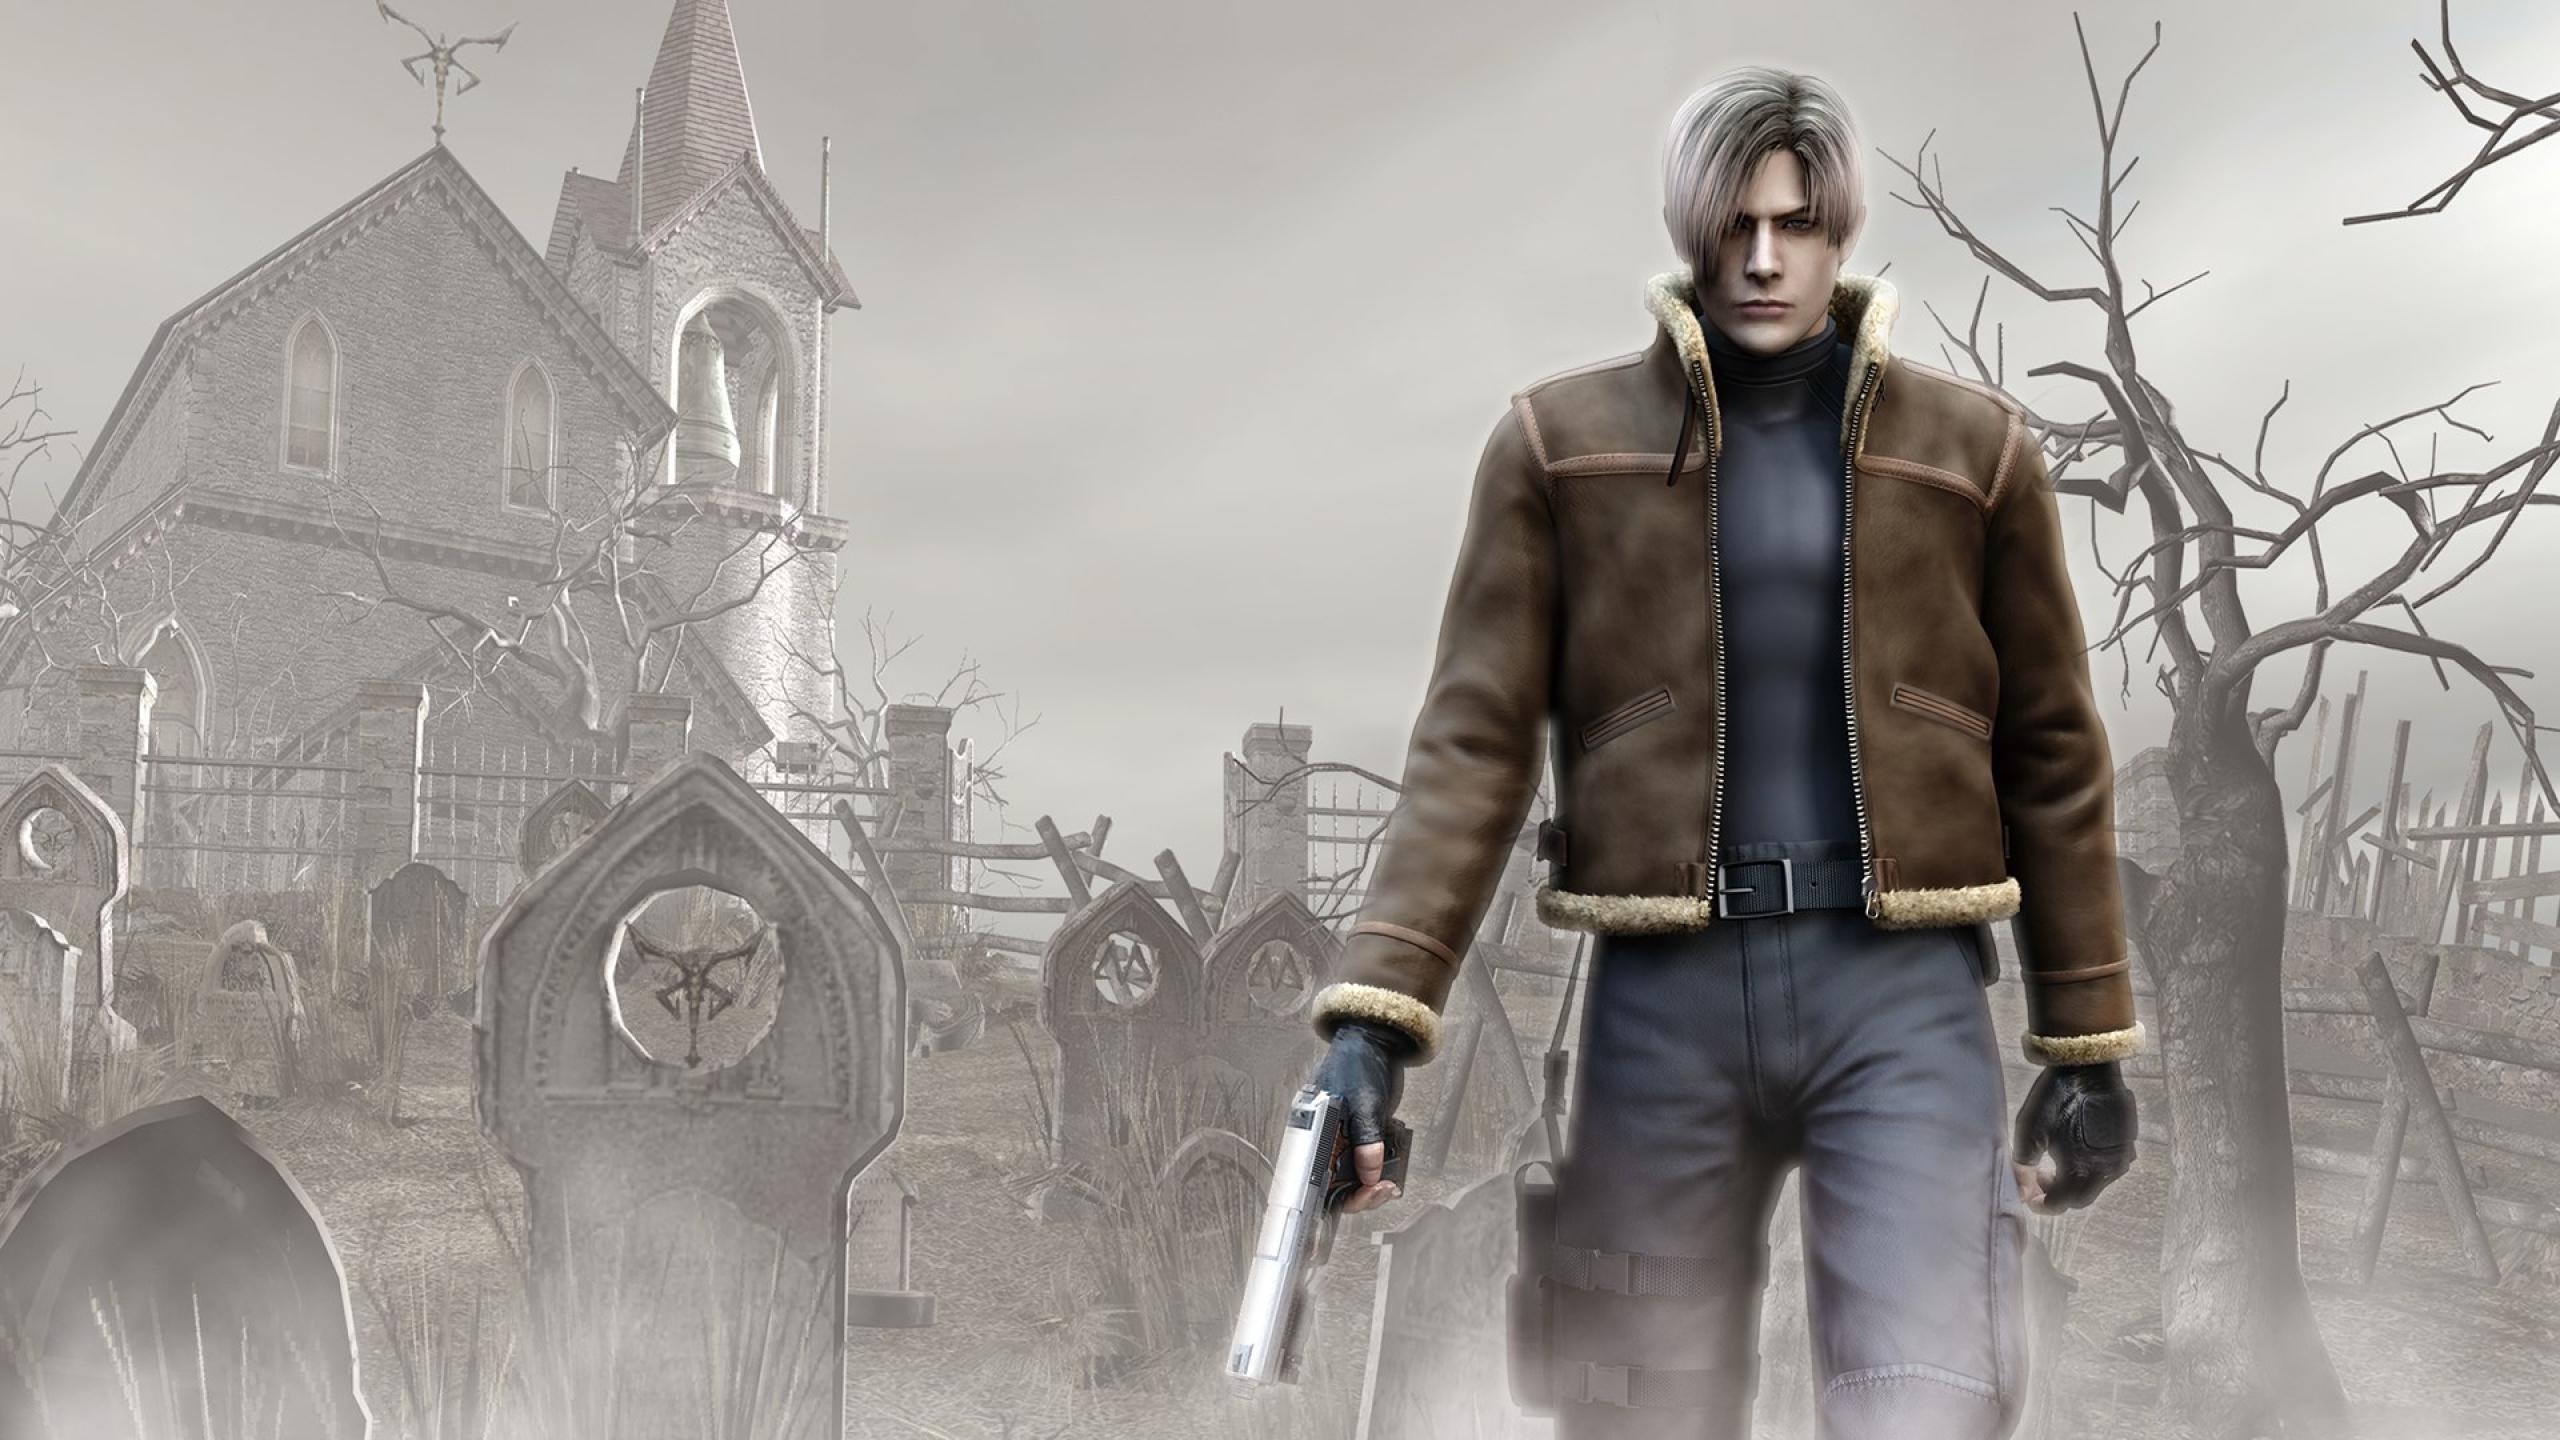 2560x1440 Resident Evil 4 Leon S Kennedy 1440p Resolution